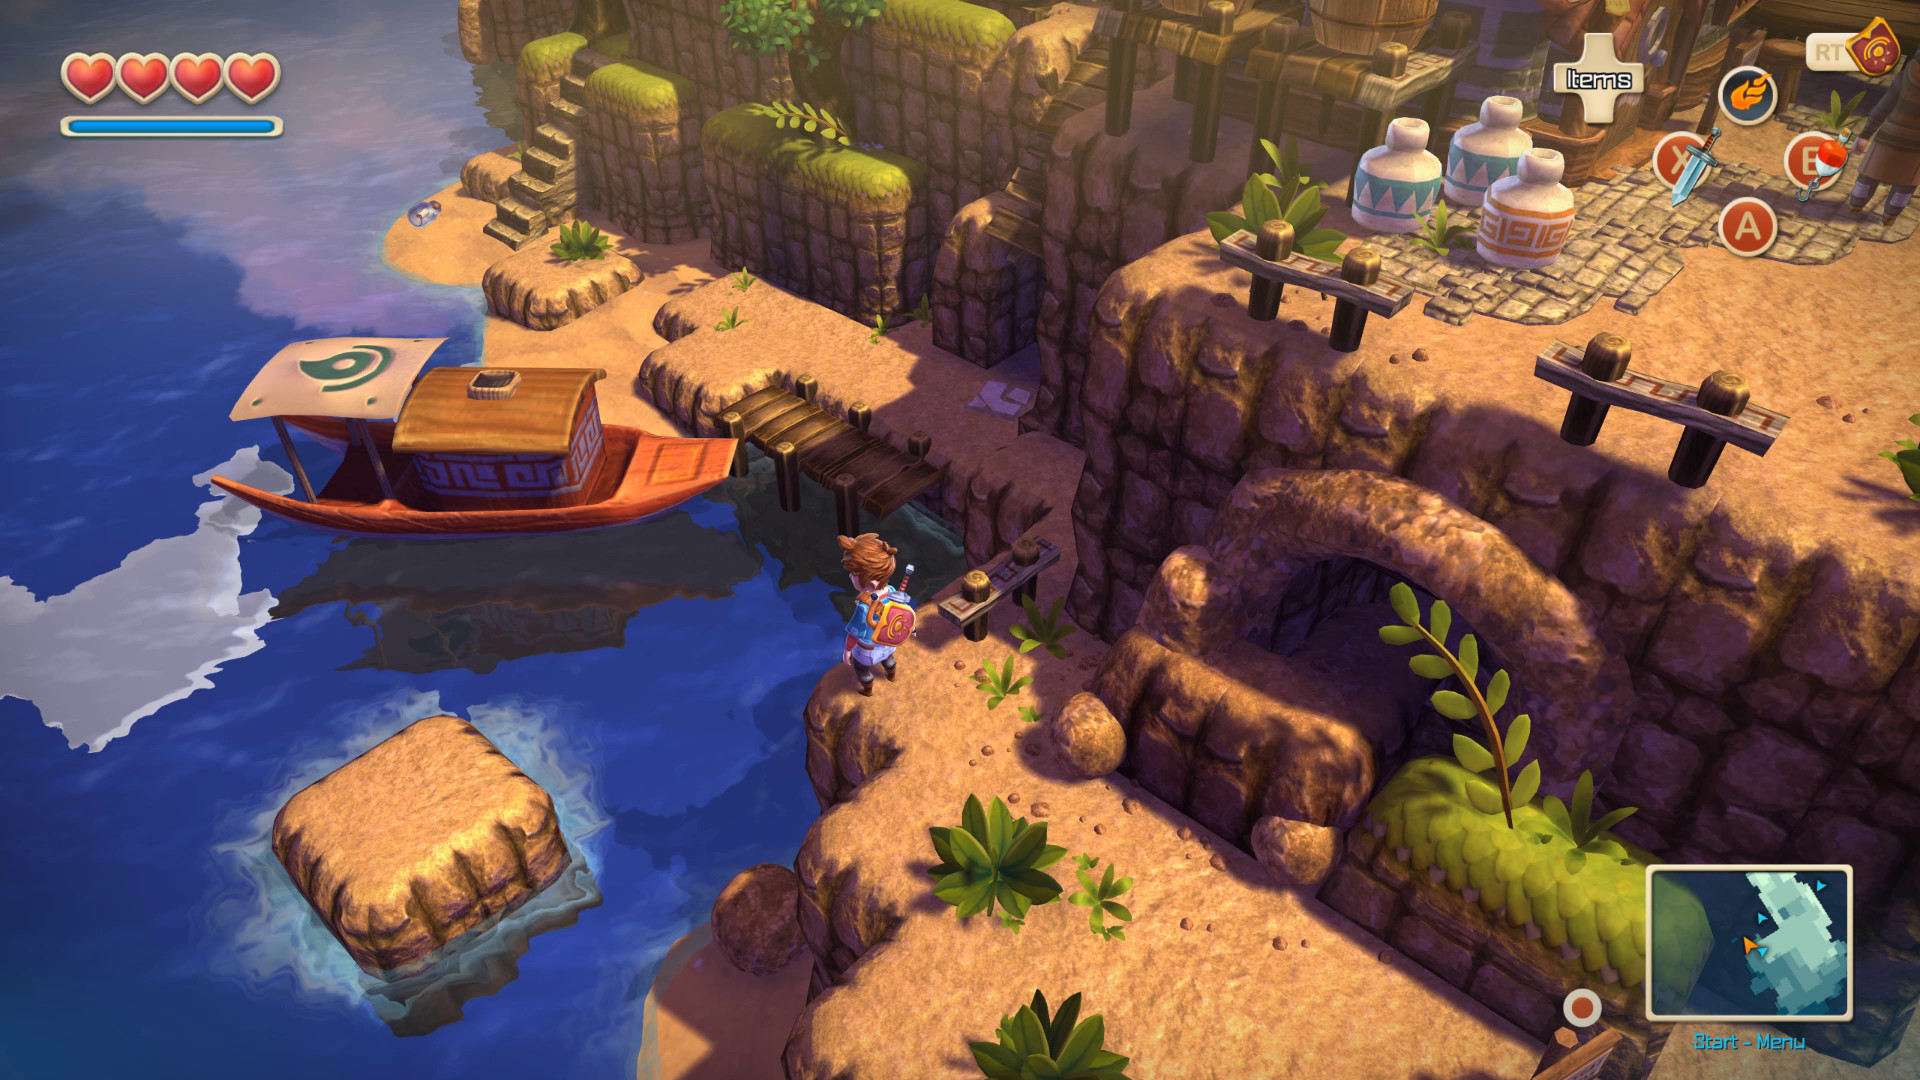 Oceanhorn Monster Of Uncharted Seas On Steam